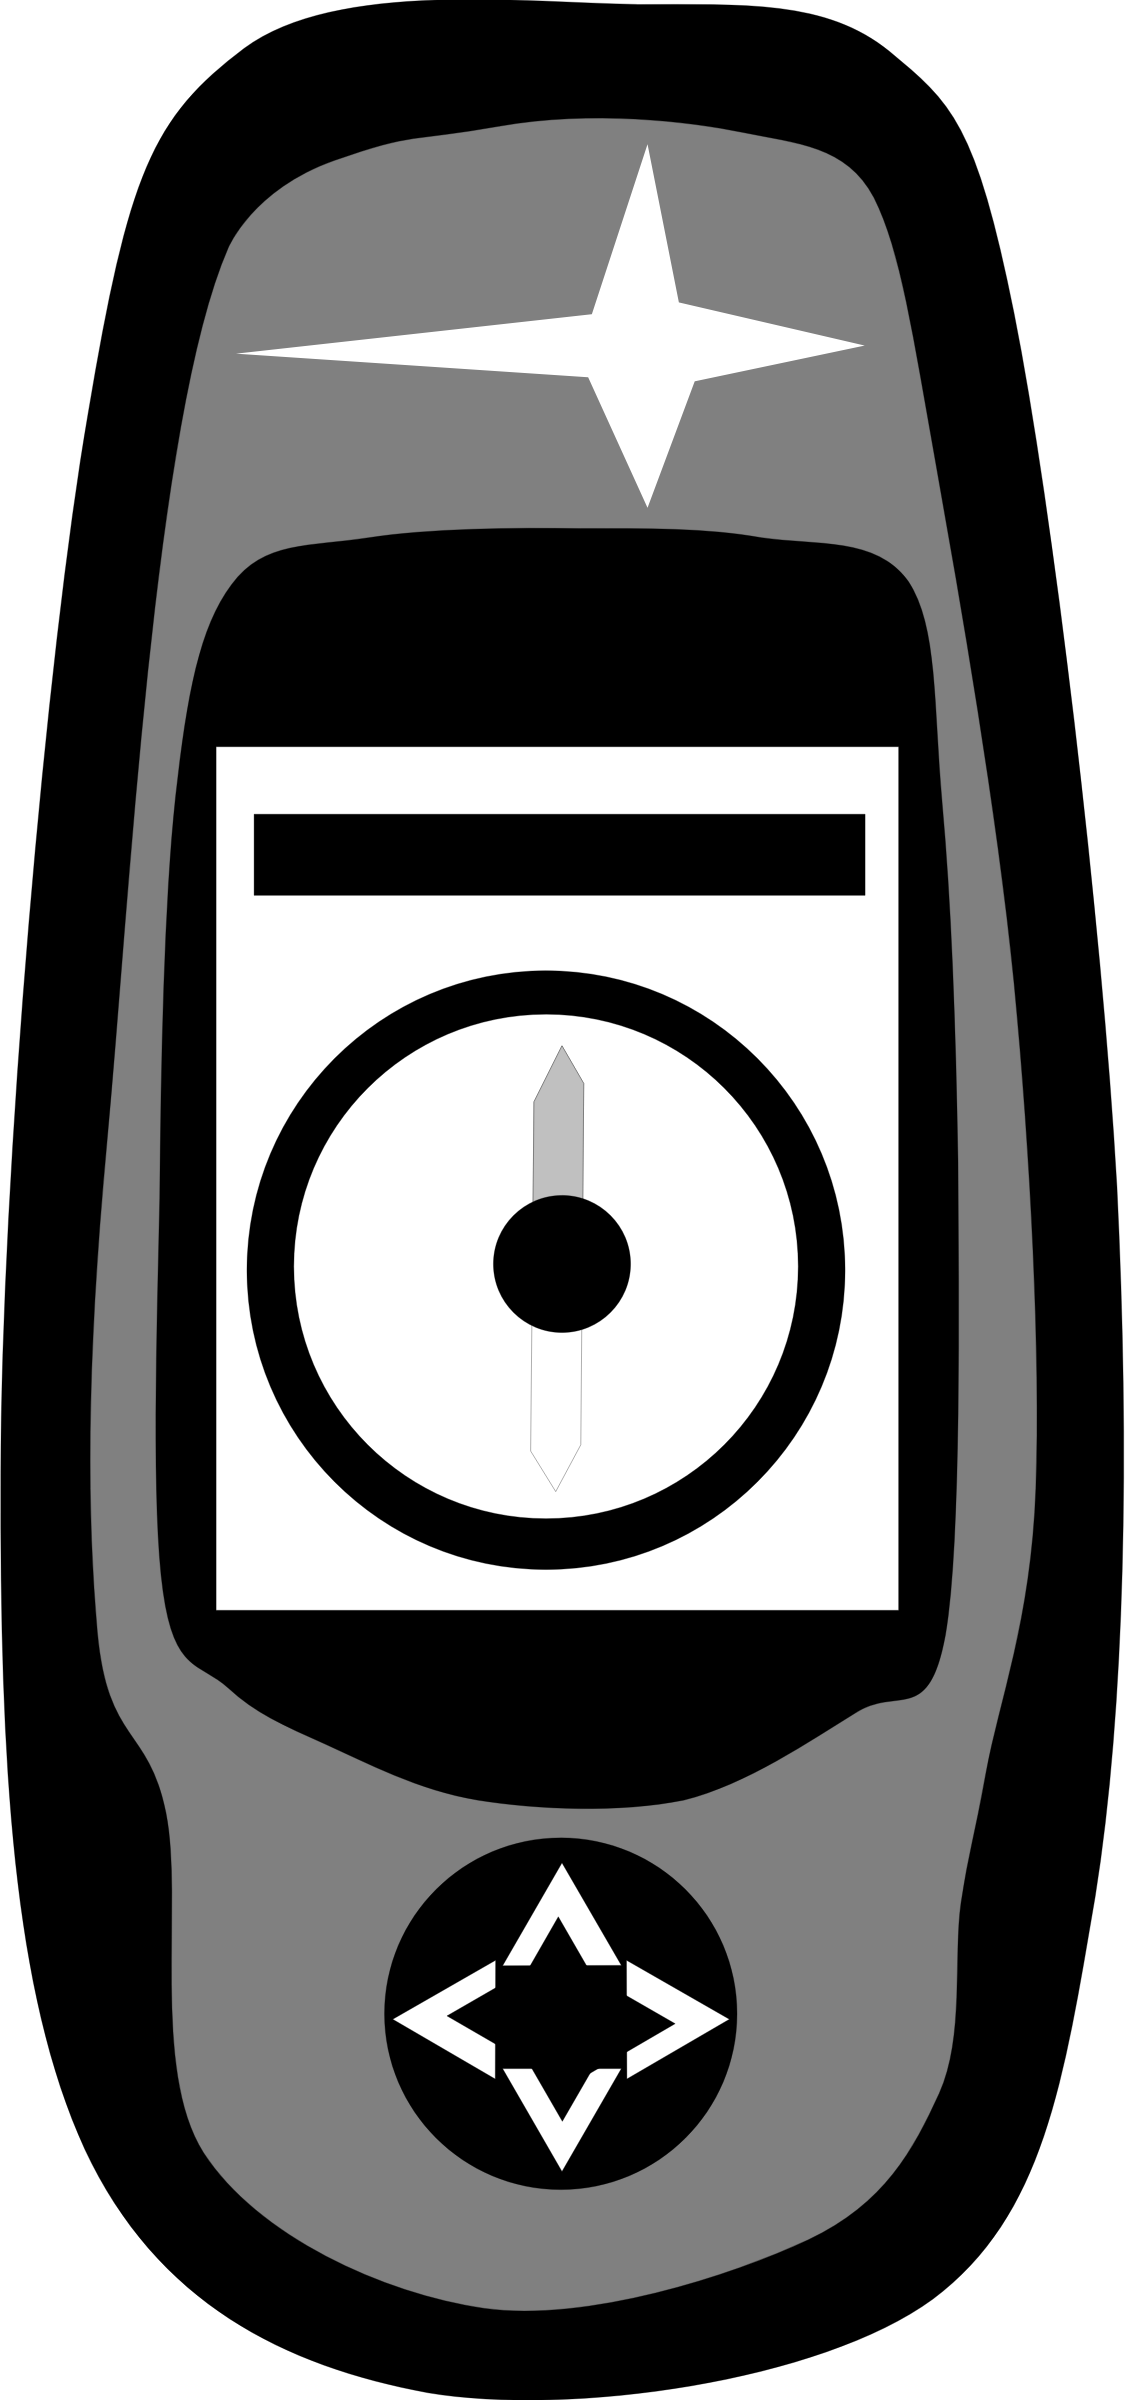 vector transparent stock Gps clipart. Magelan handheld big image.